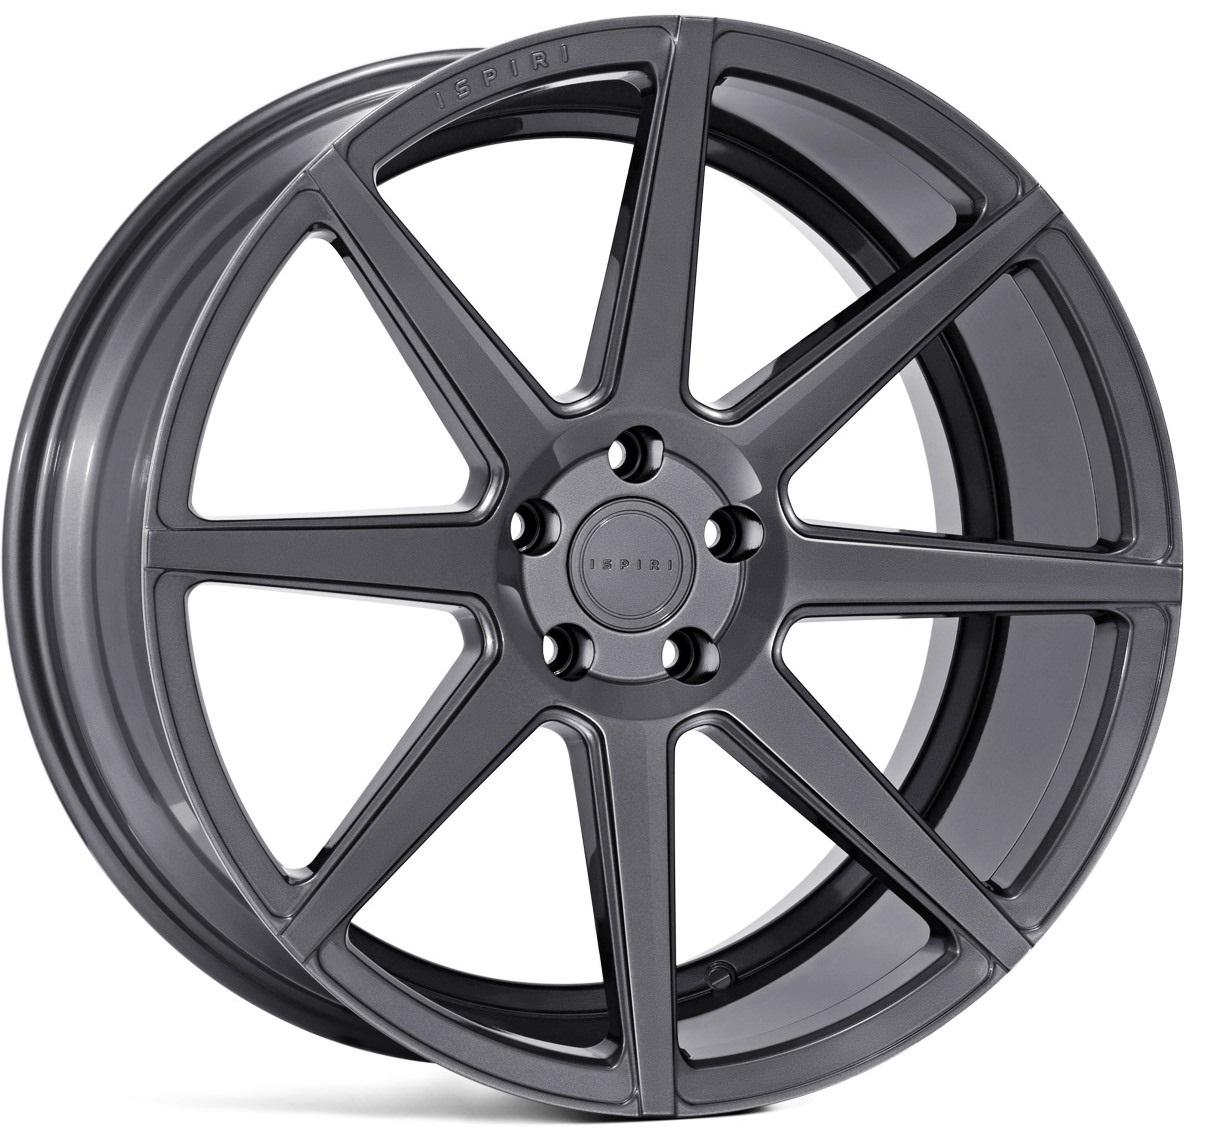 IW Automotive - ISR8 (Carbon Graphite)